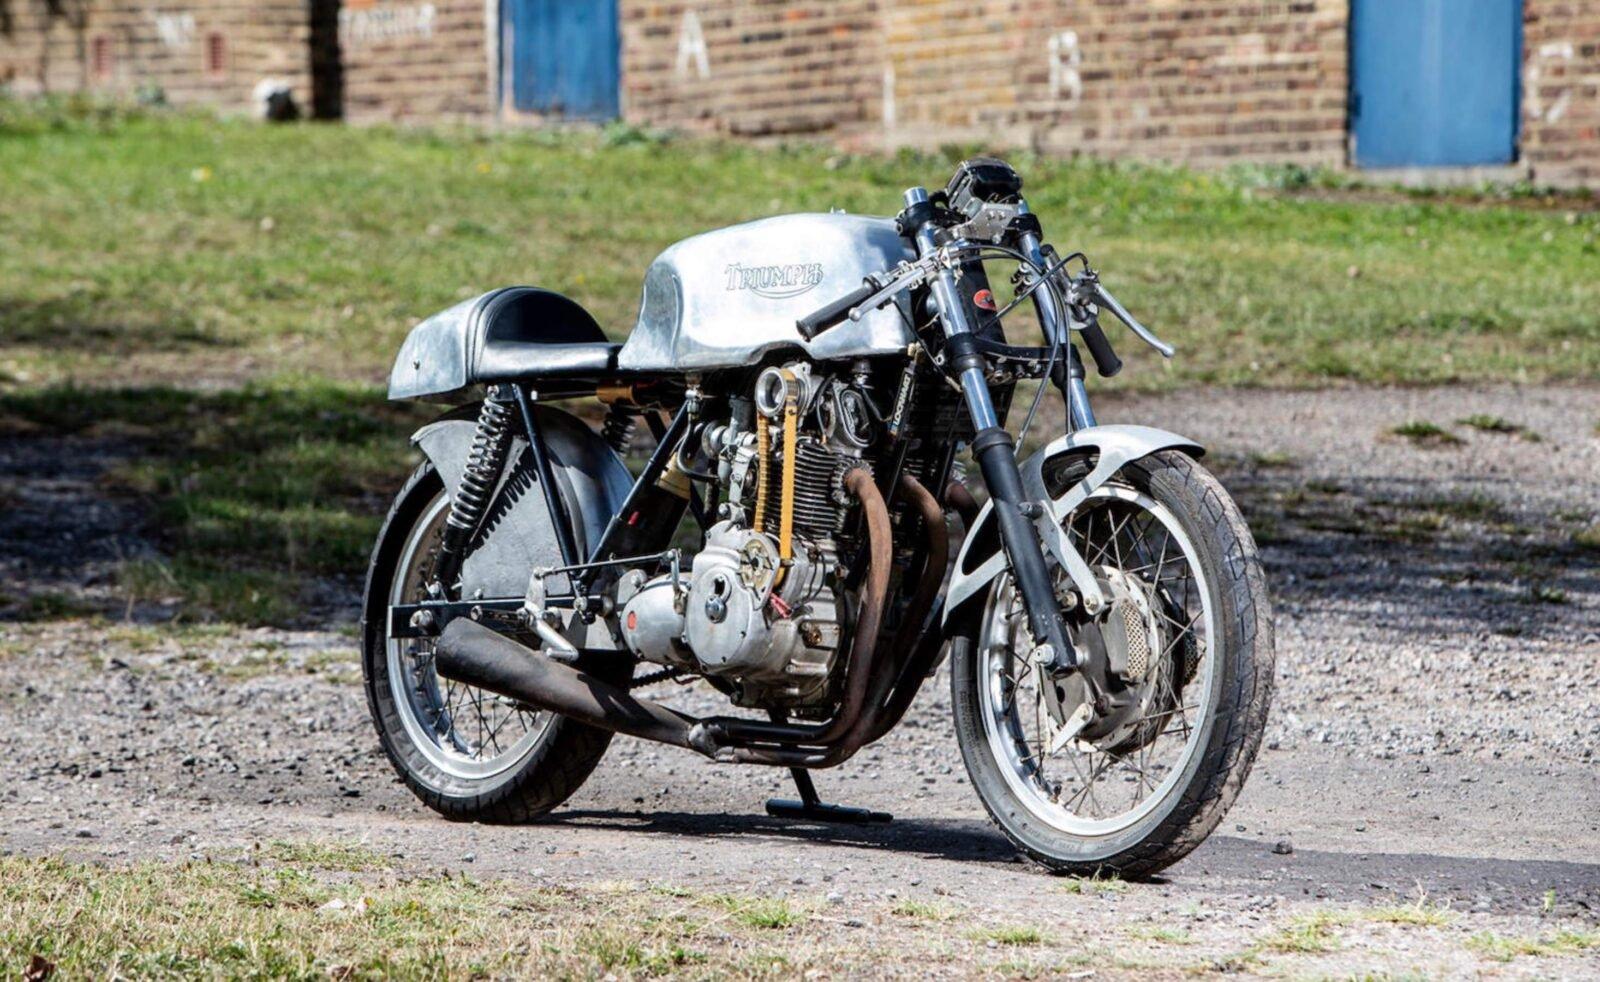 Egli-Triumph Prototype OHC Engine